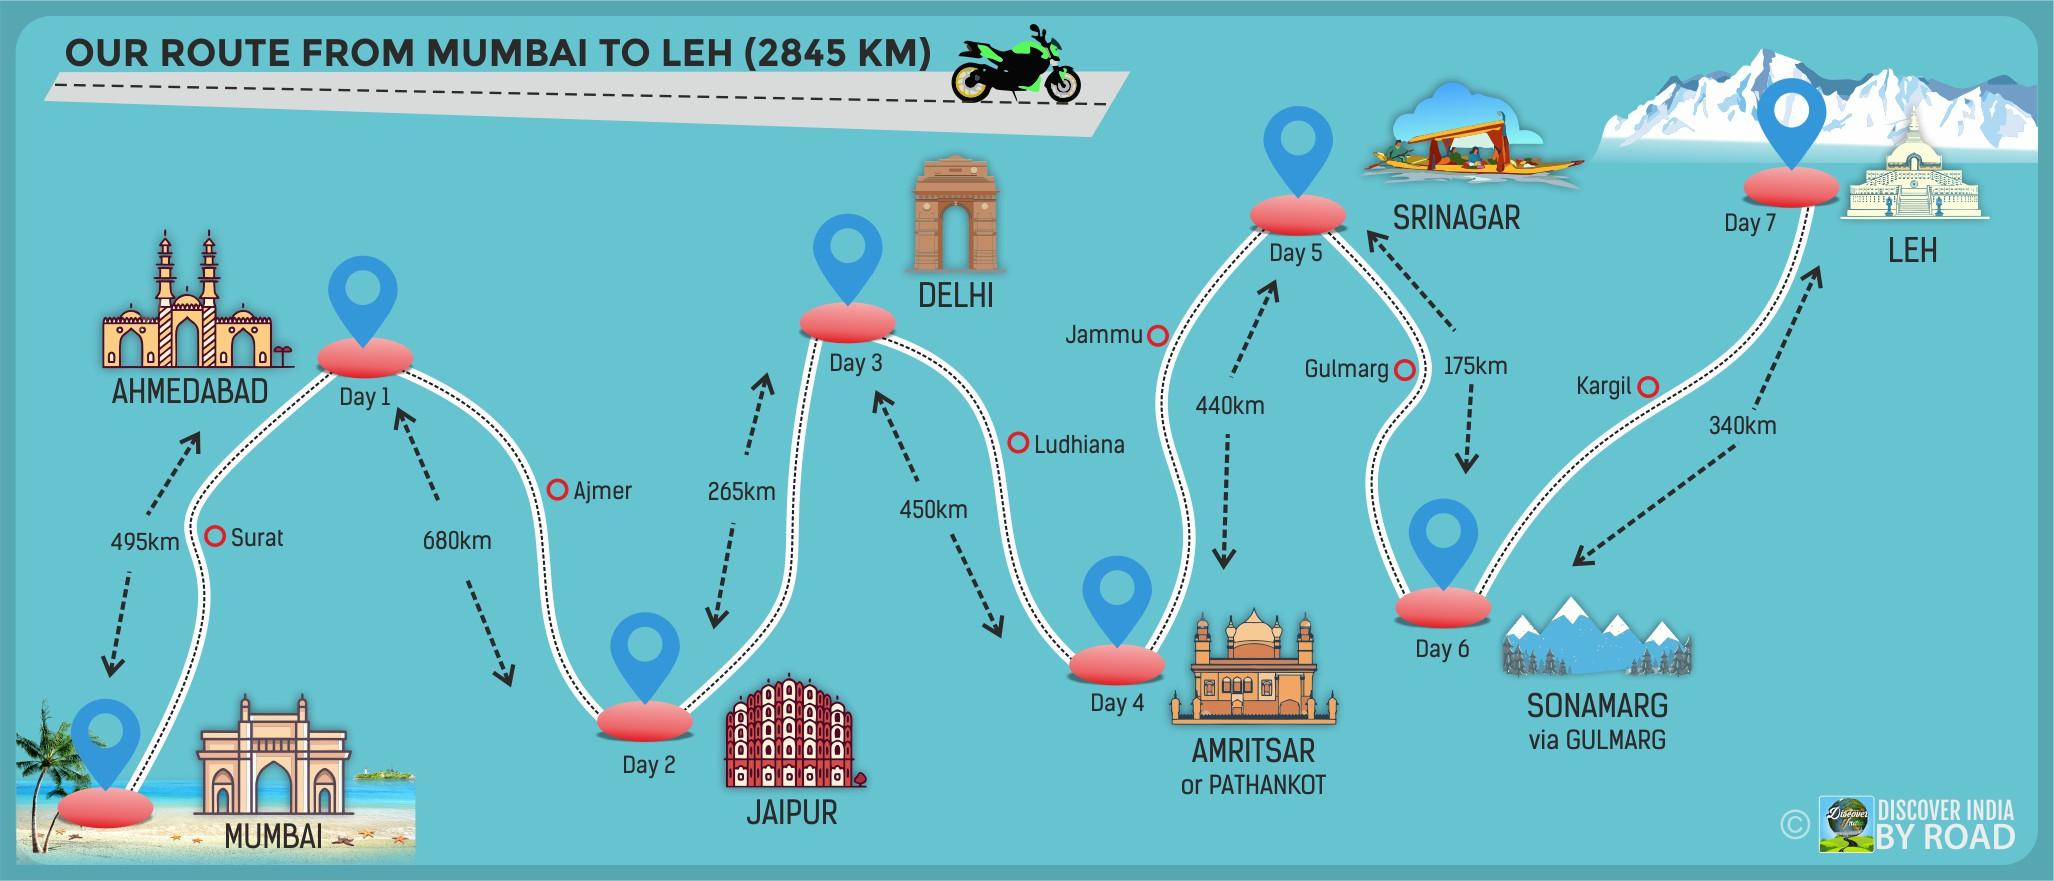 Mumbai to Leh Route Map